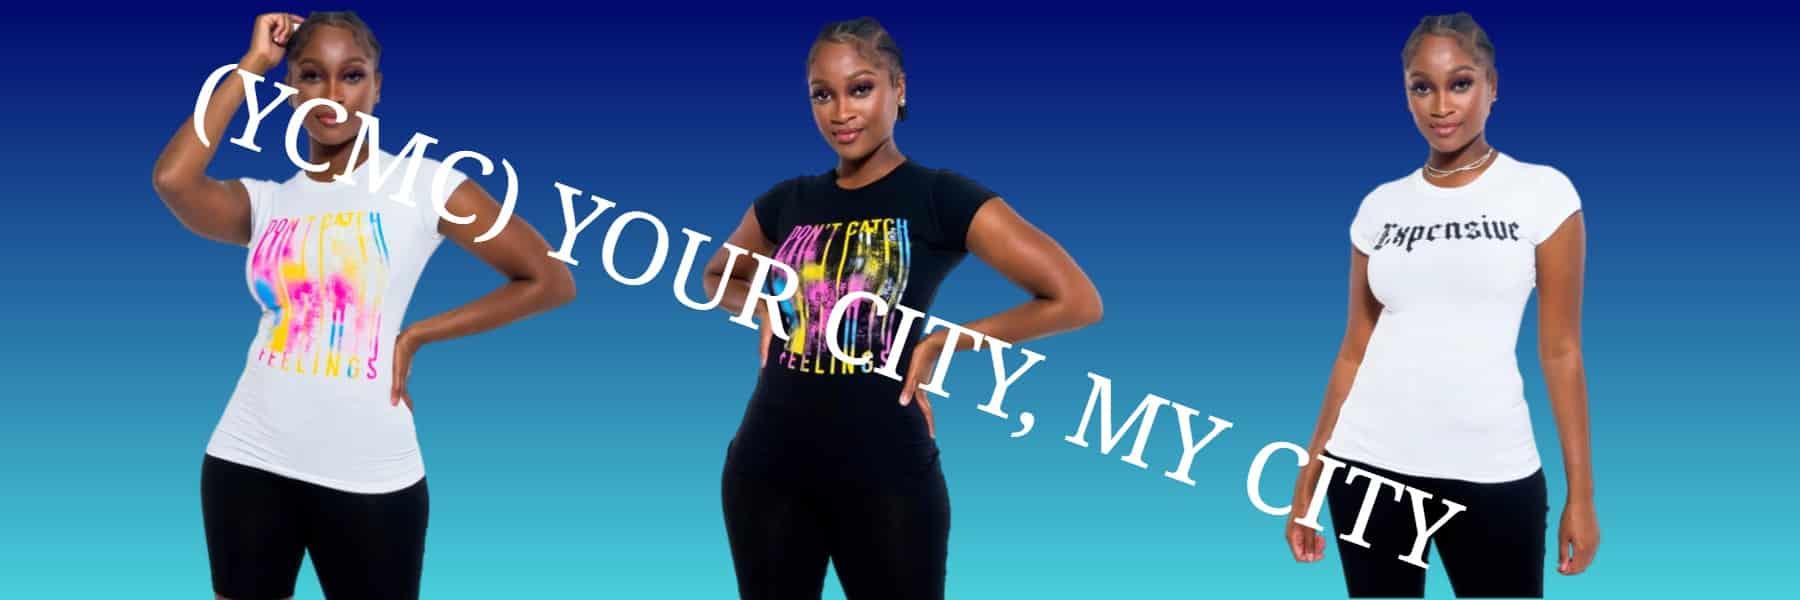 (YCMC) YOUR CITY, MY CITY